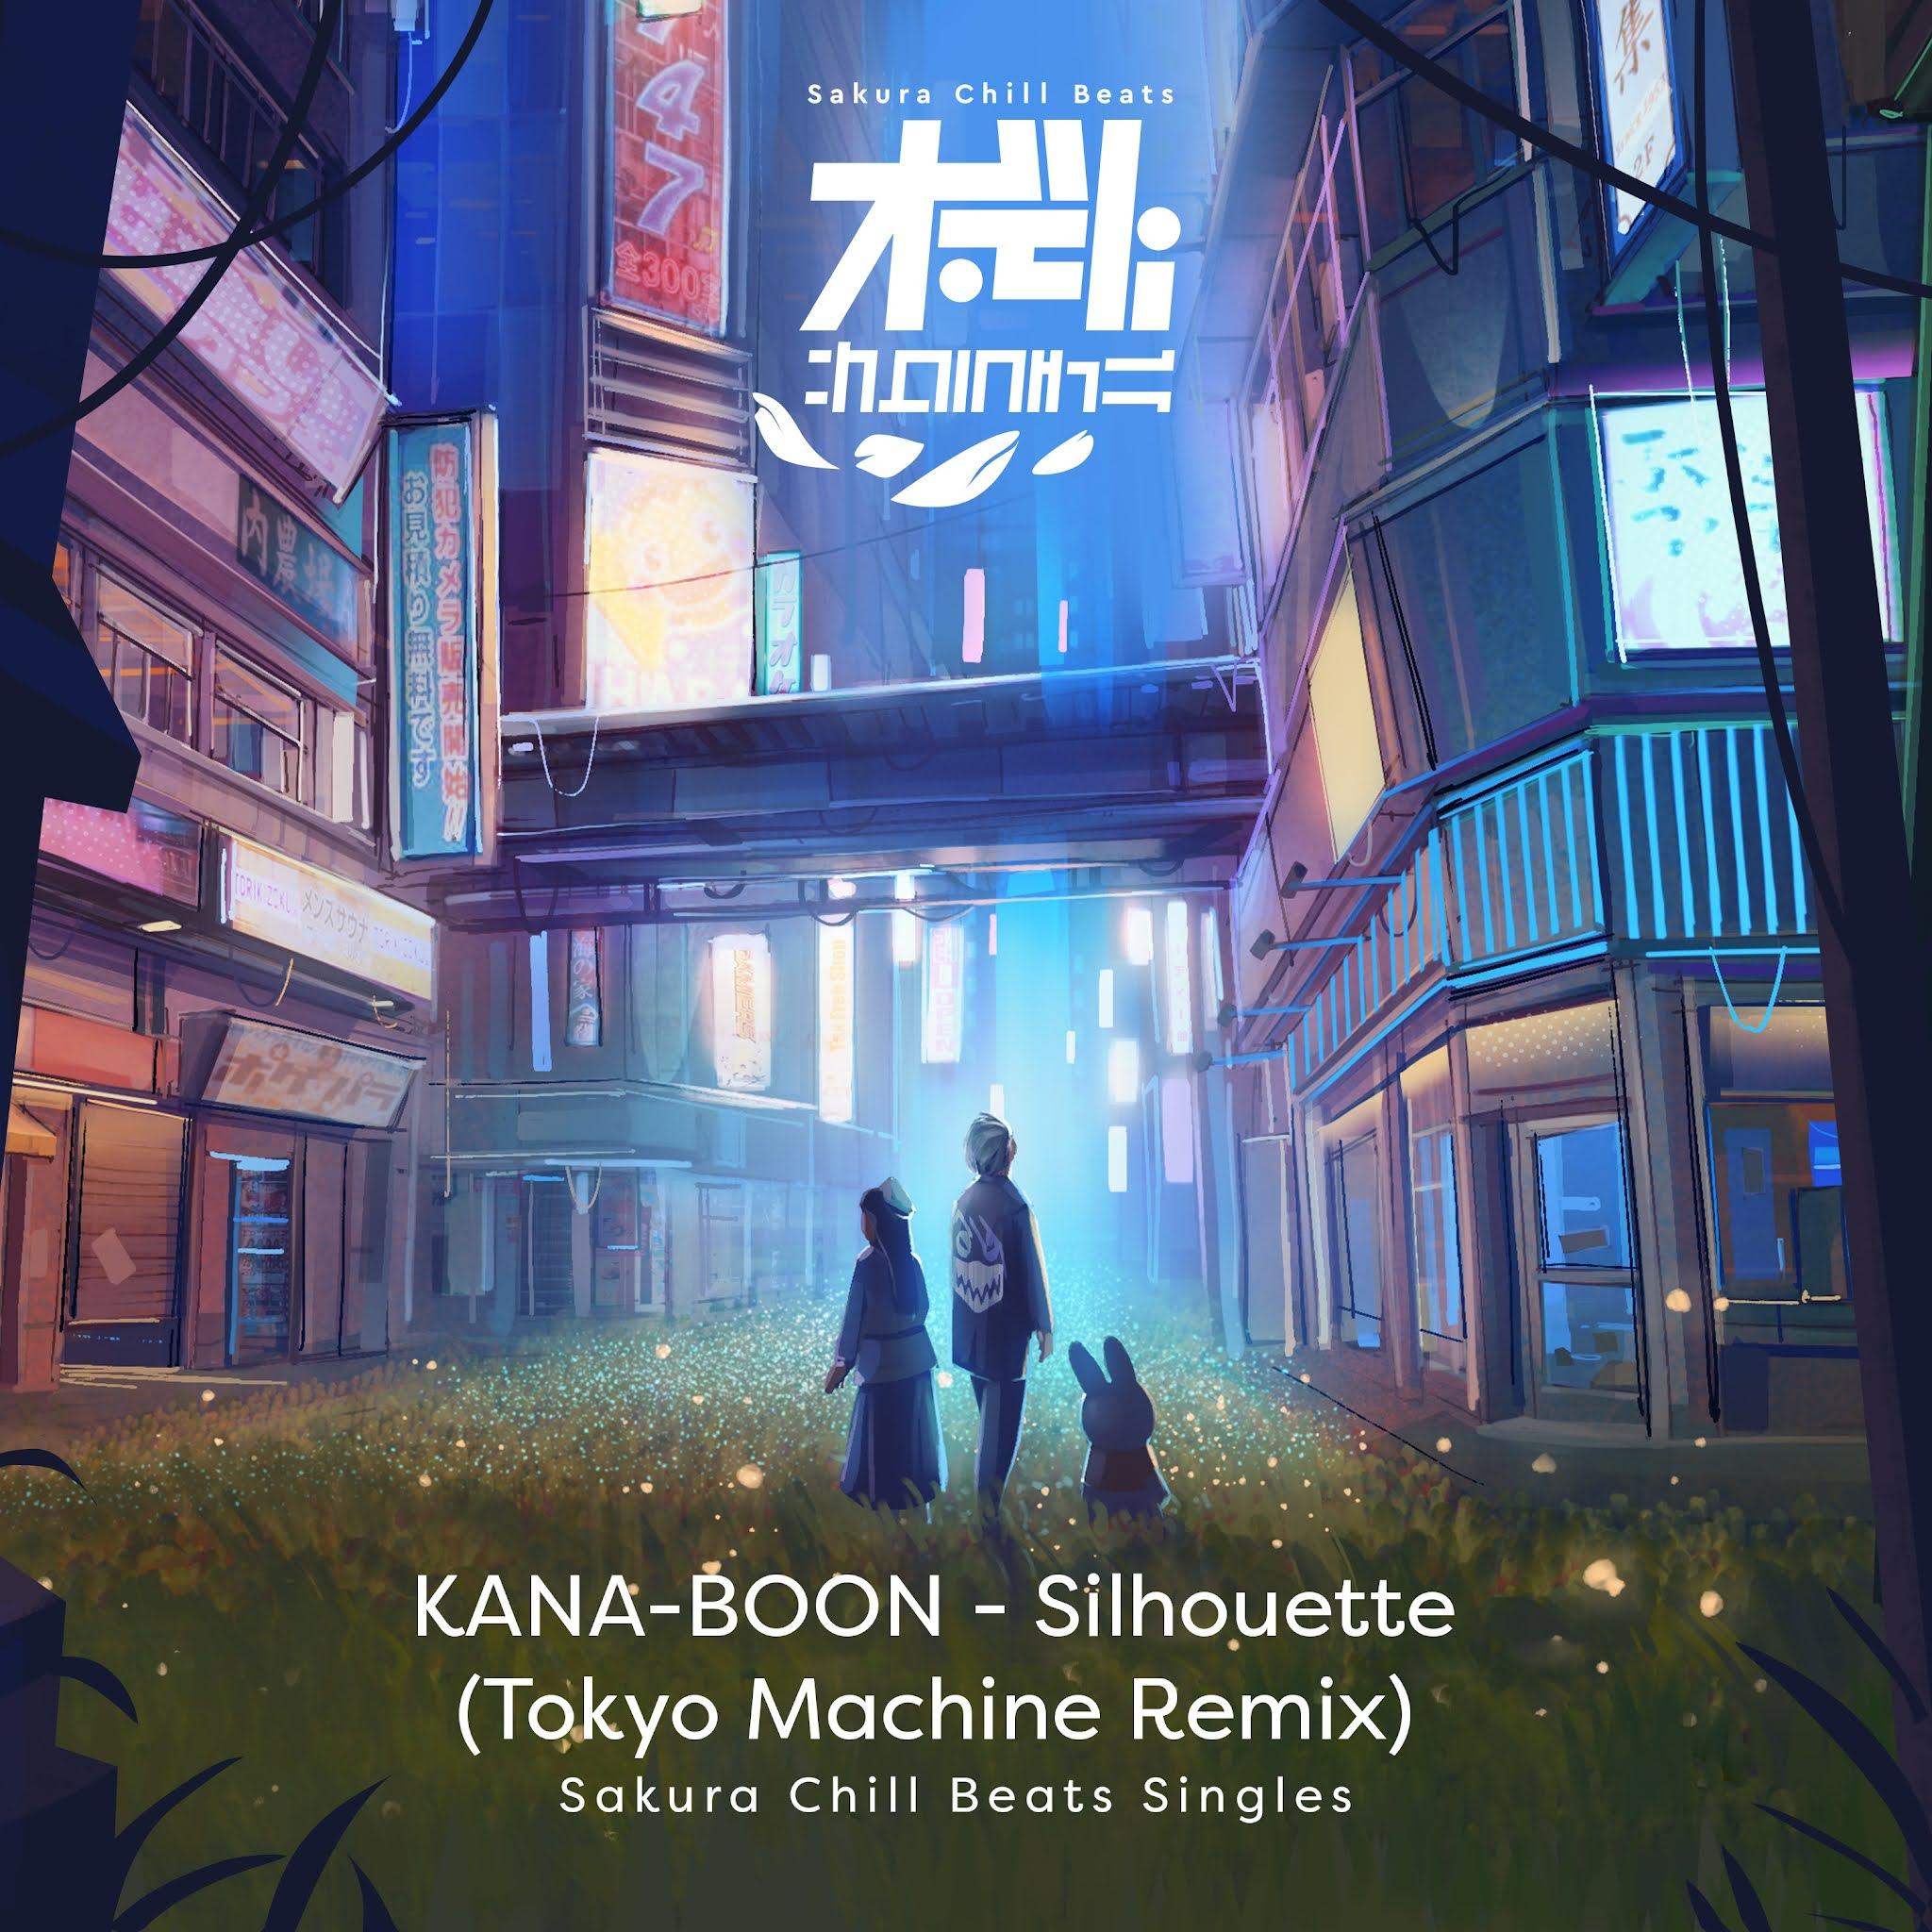 KANA-BOON - Silhouette (TOKYO MACHINE Remix)